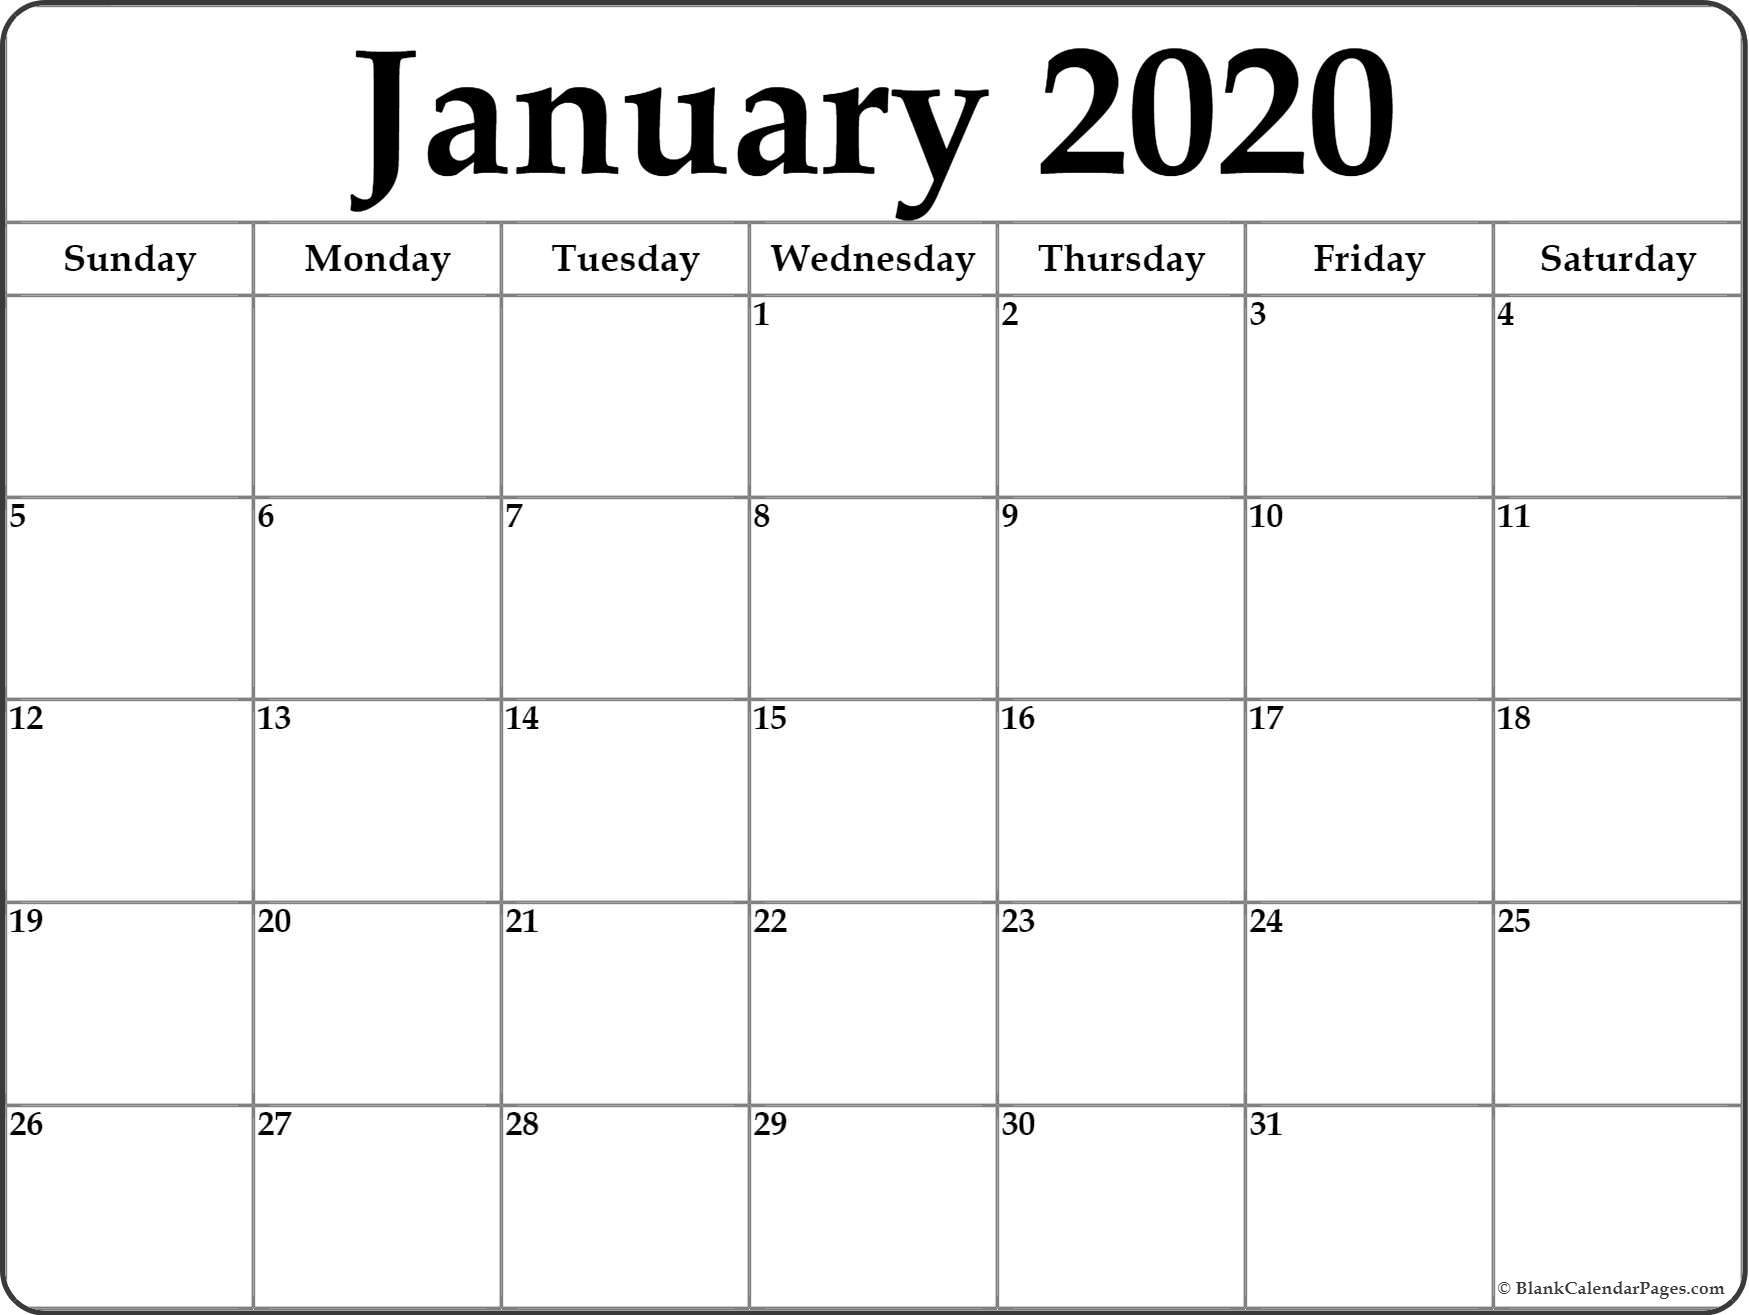 January 2020 Calendar   Free Printable Monthly Calendars  Free Printable 2020 Monthly Calendar